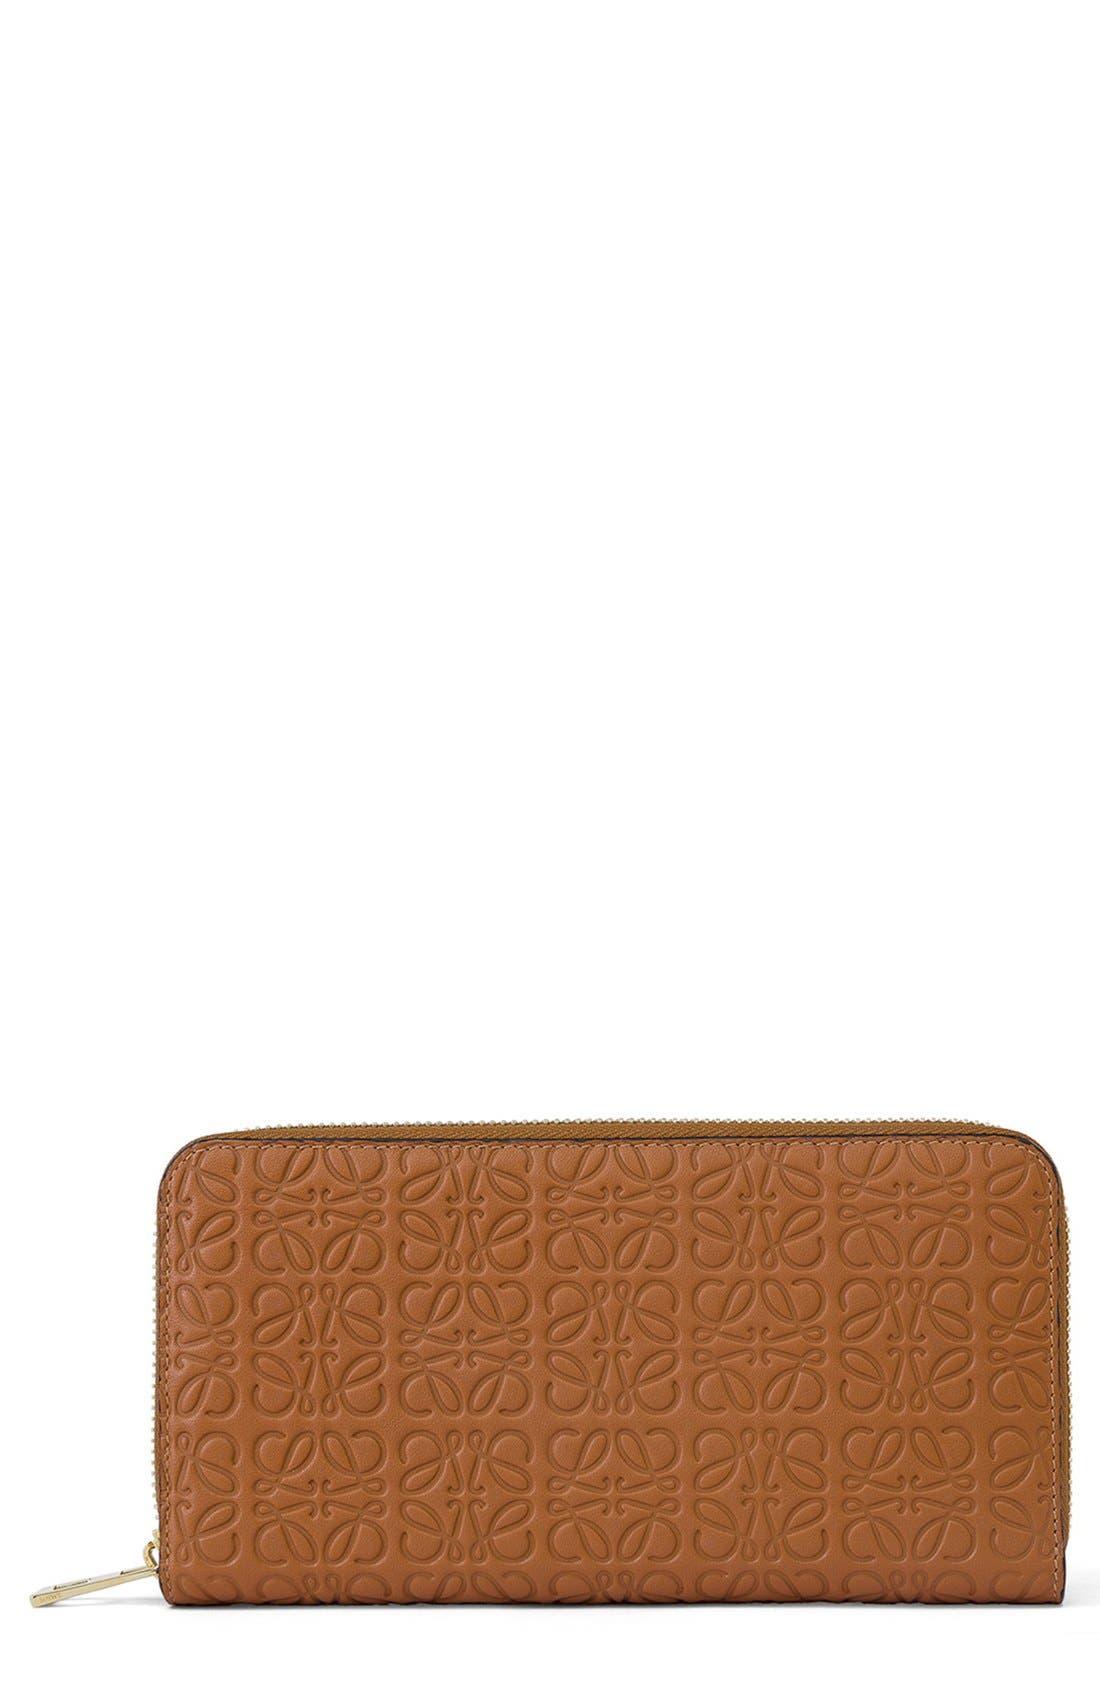 LOEWE Leather Zip Around Wallet